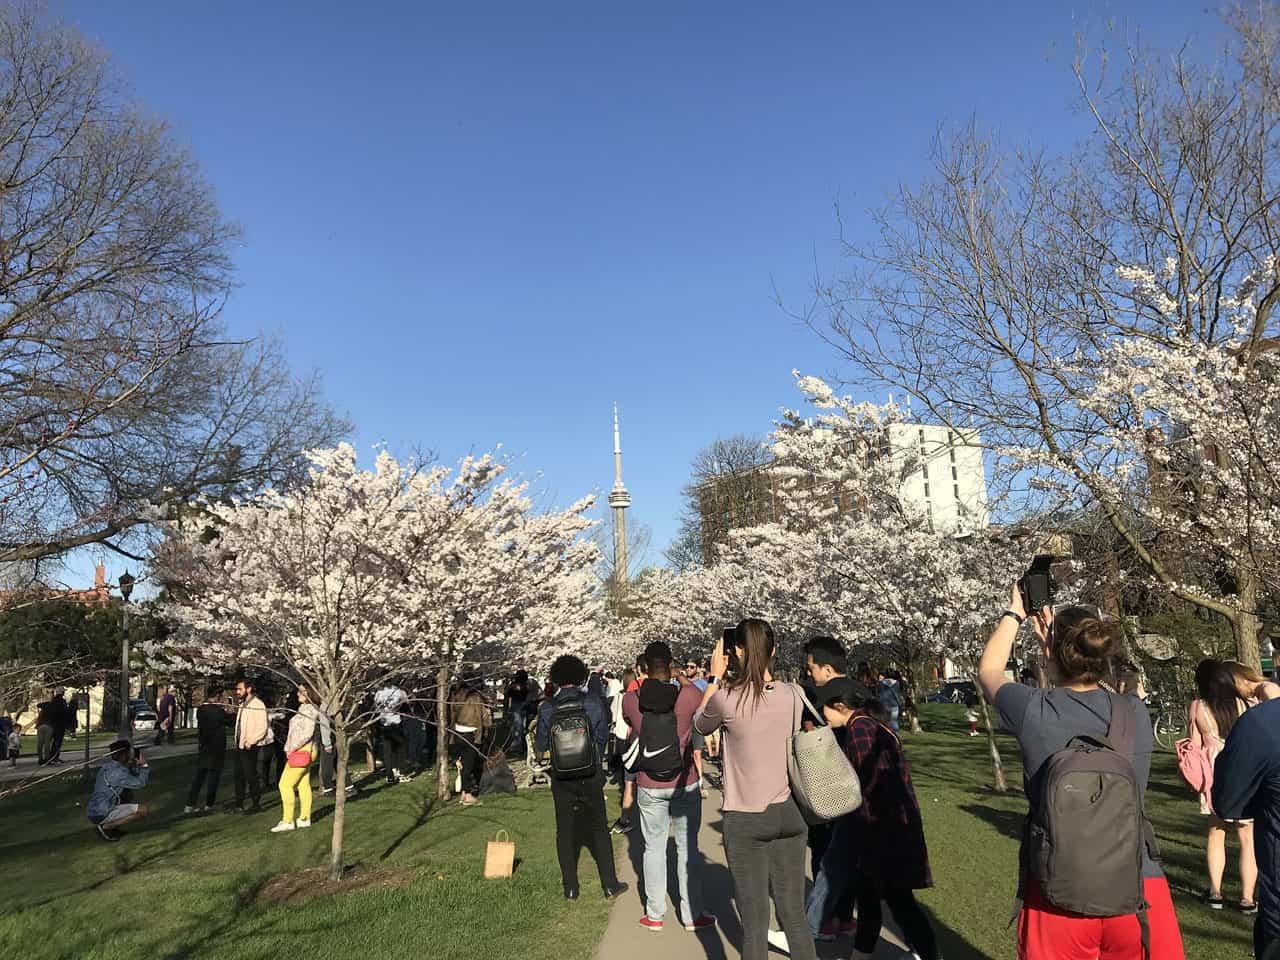 trees flowering at trinity bellwoods park